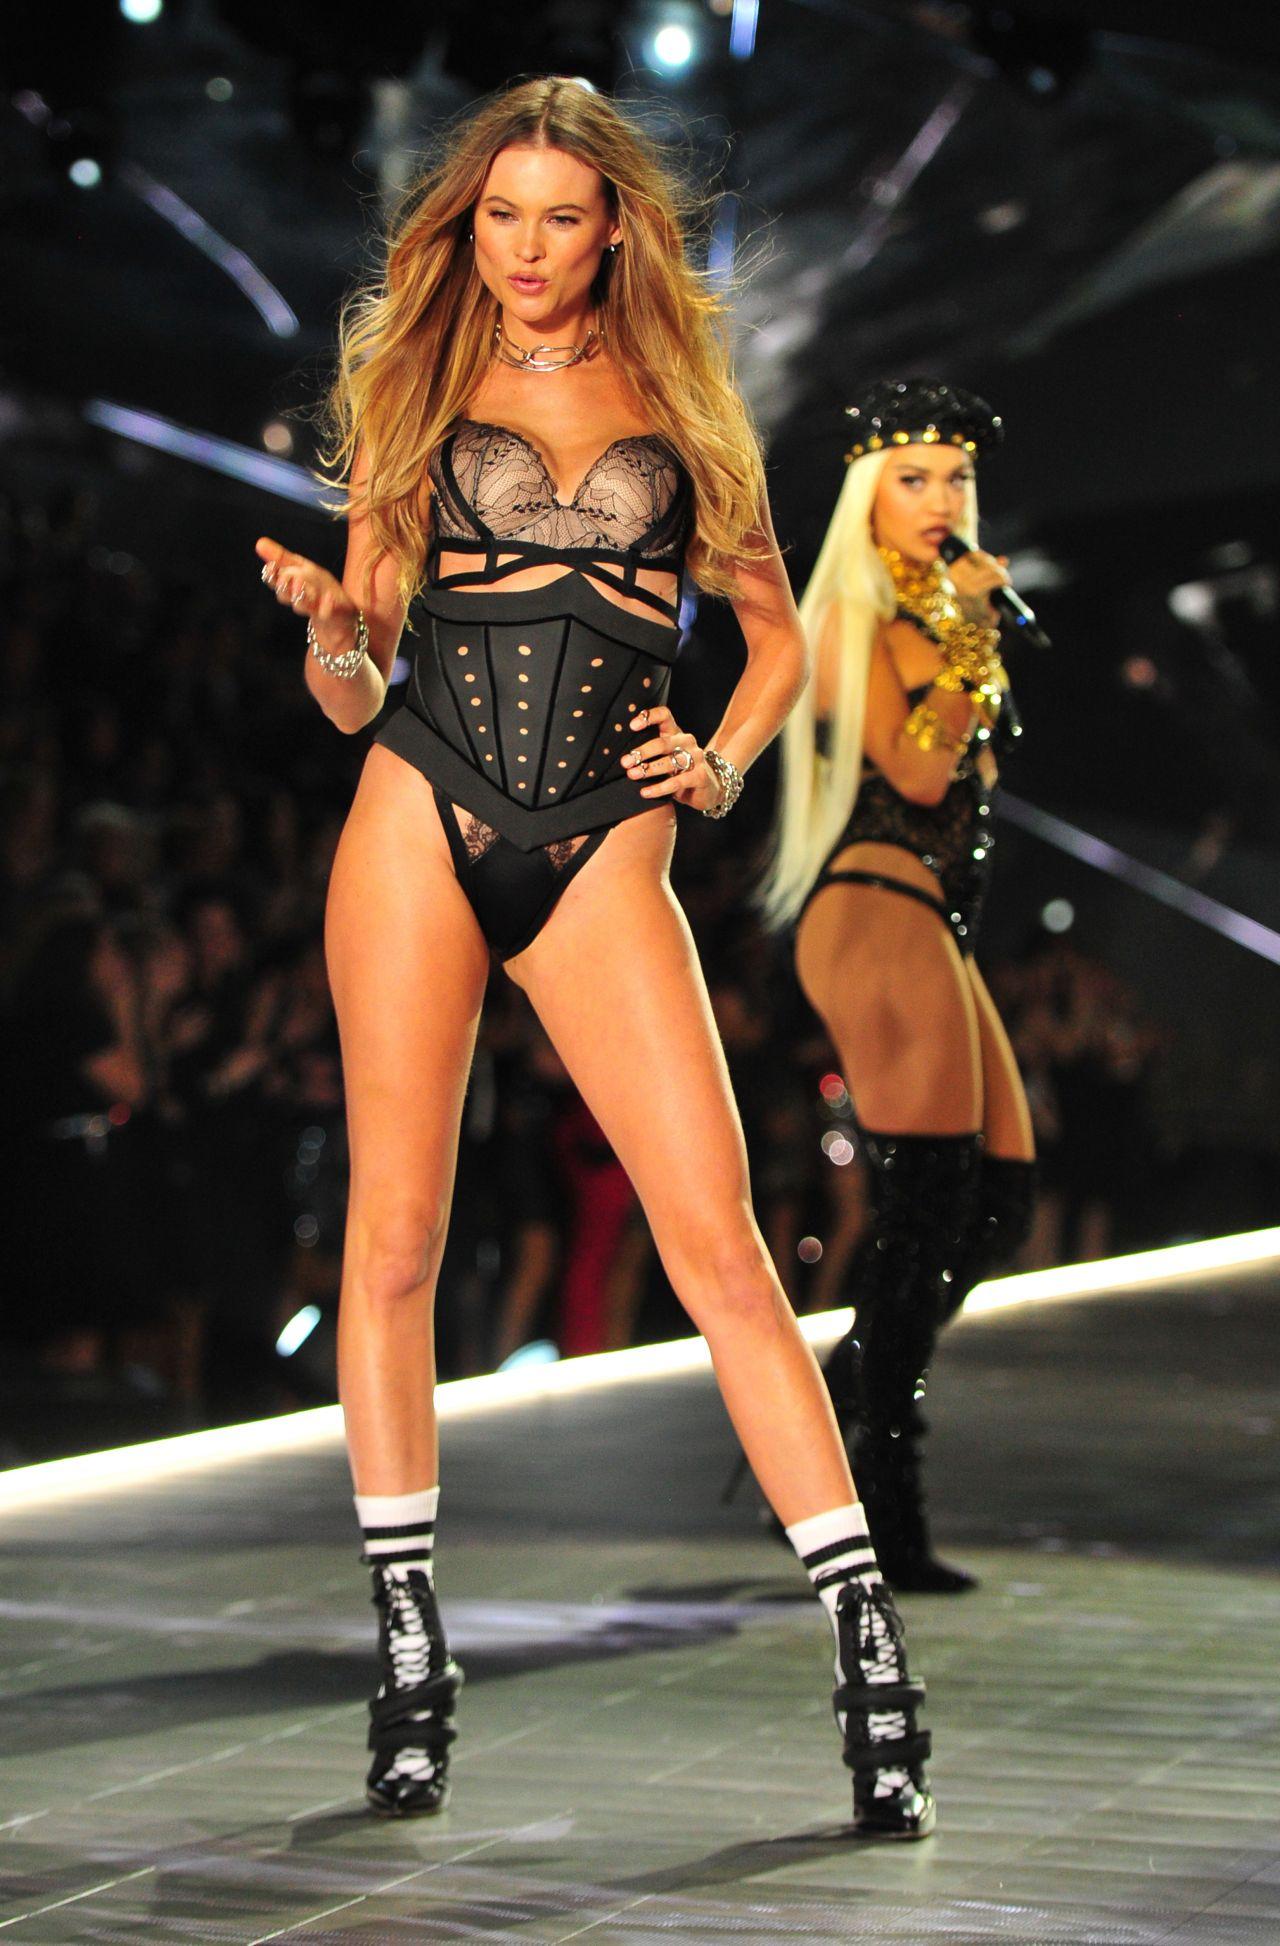 Image Result For Victoria Secret Fashion Show